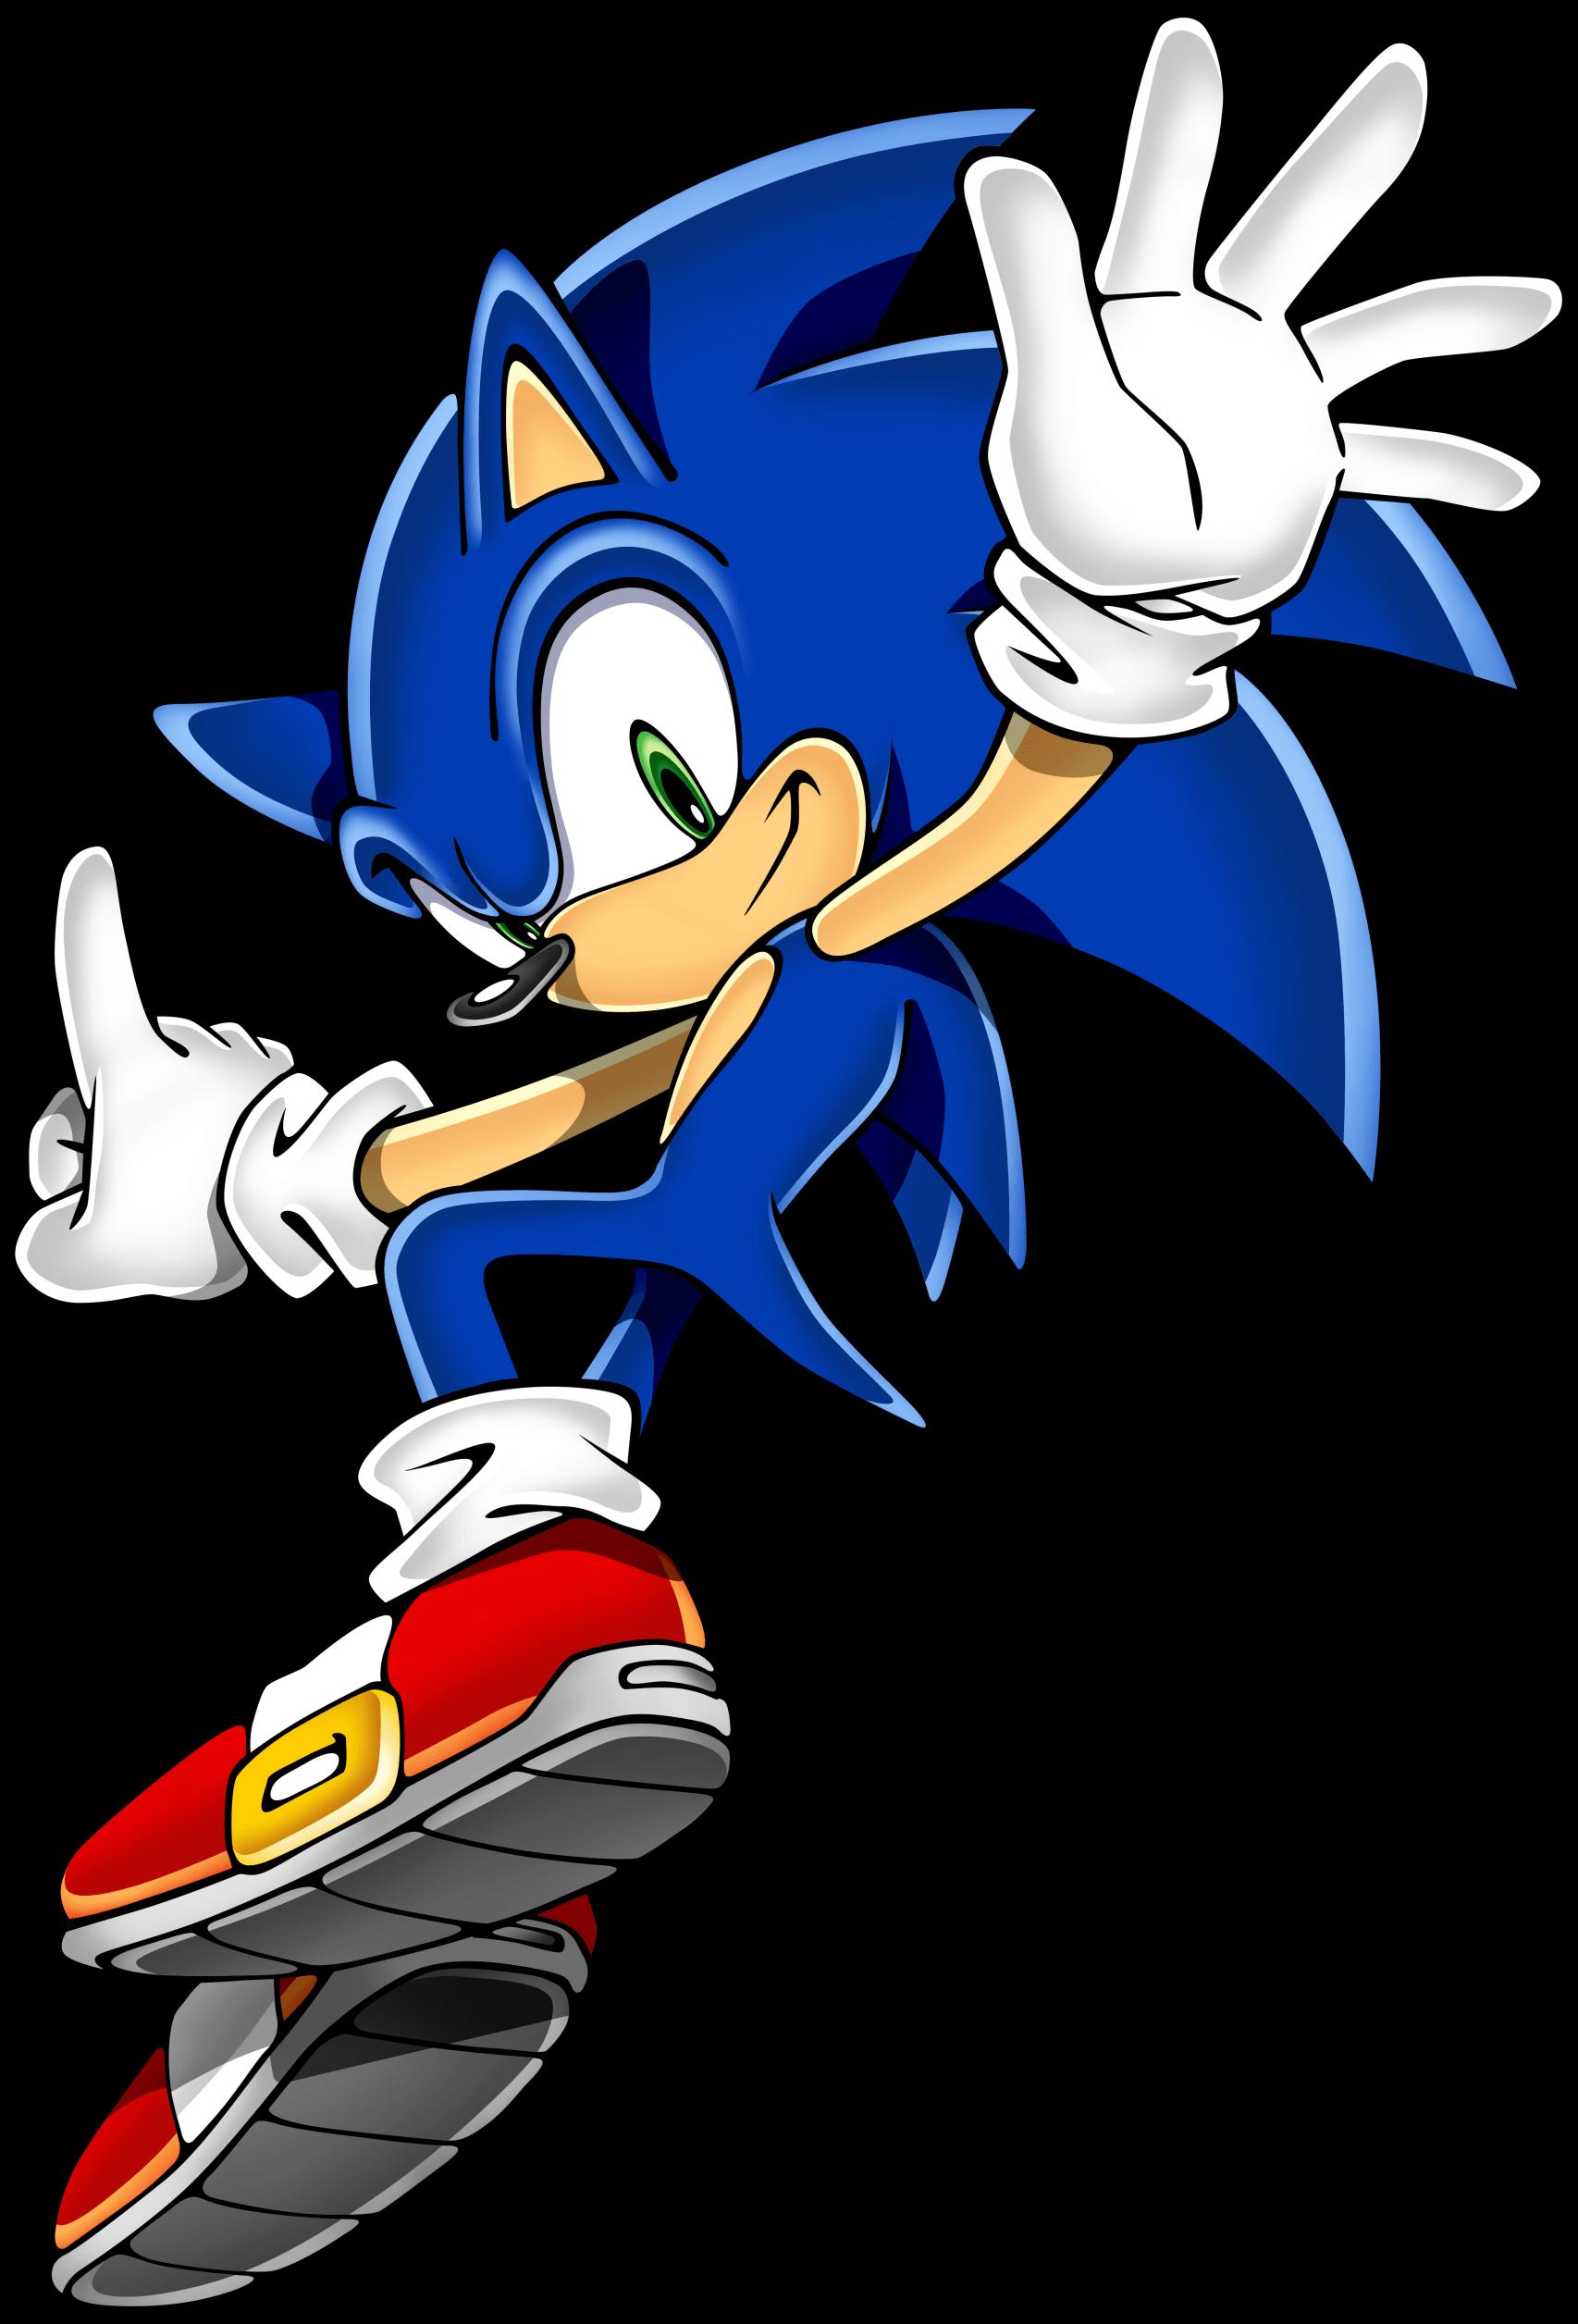 Sonic Hedgehog Jumping-Sonic Hedgehog Jumping-8